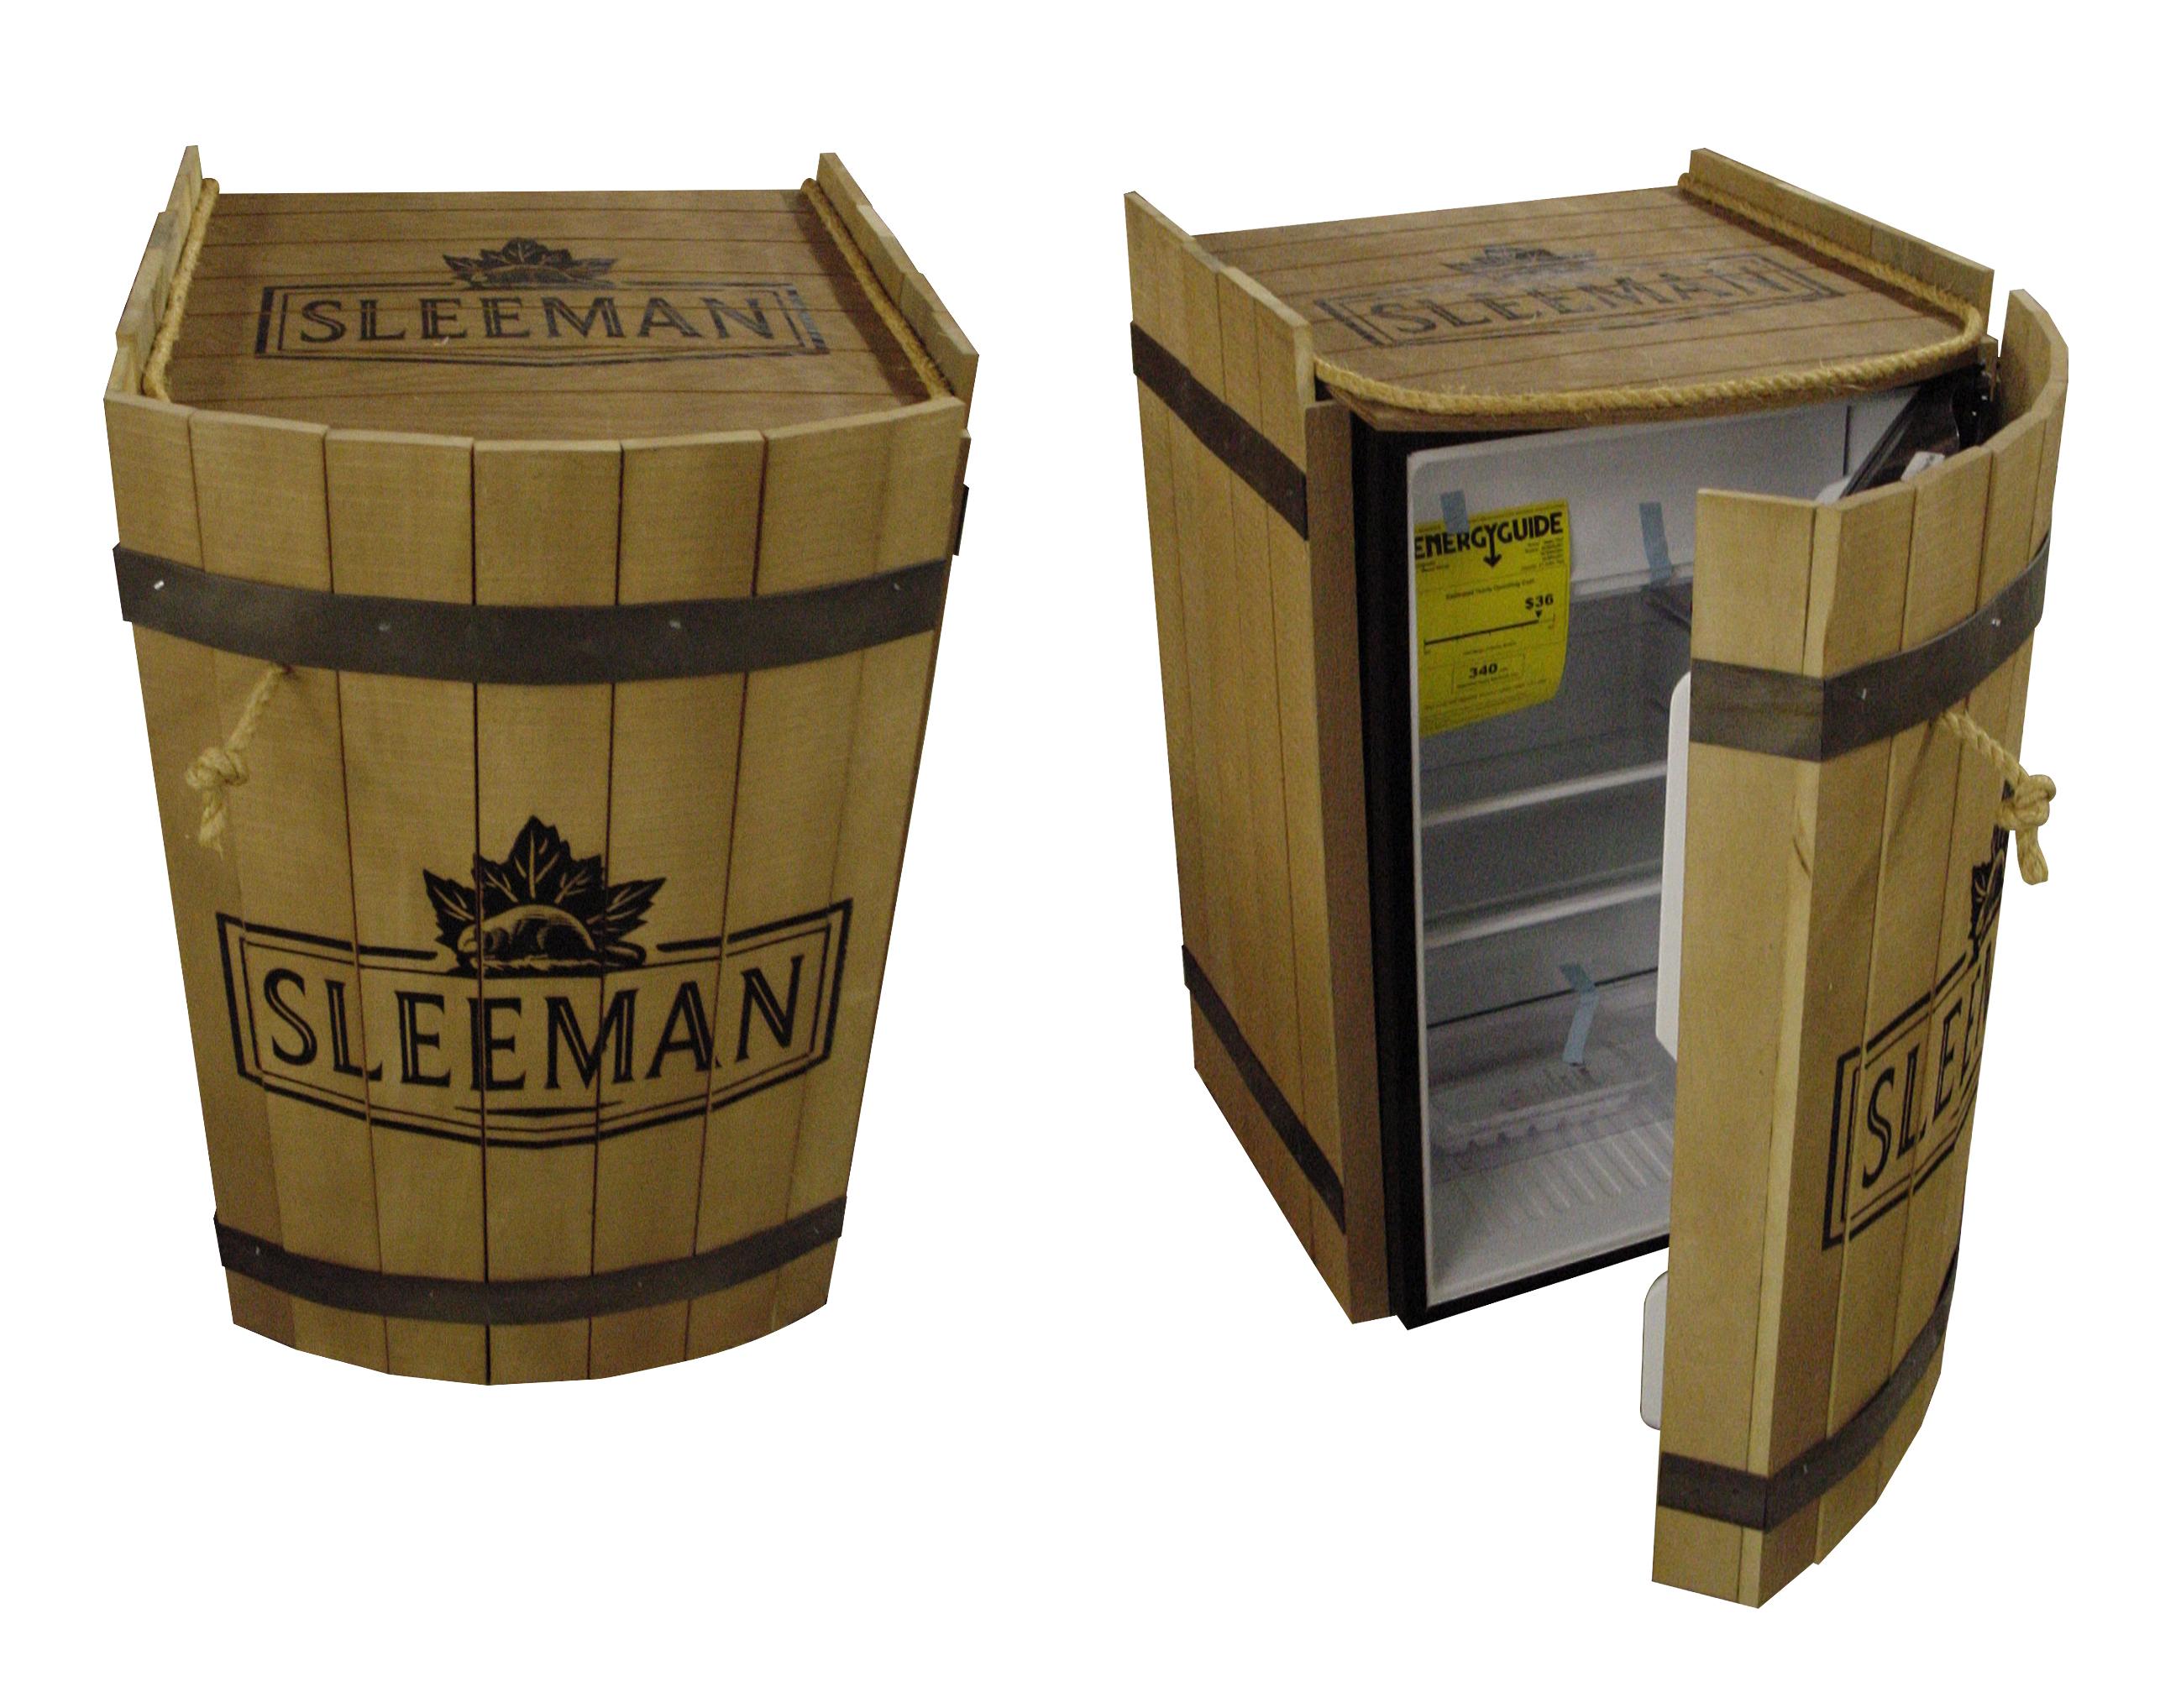 Sleeman Barrel Fridge